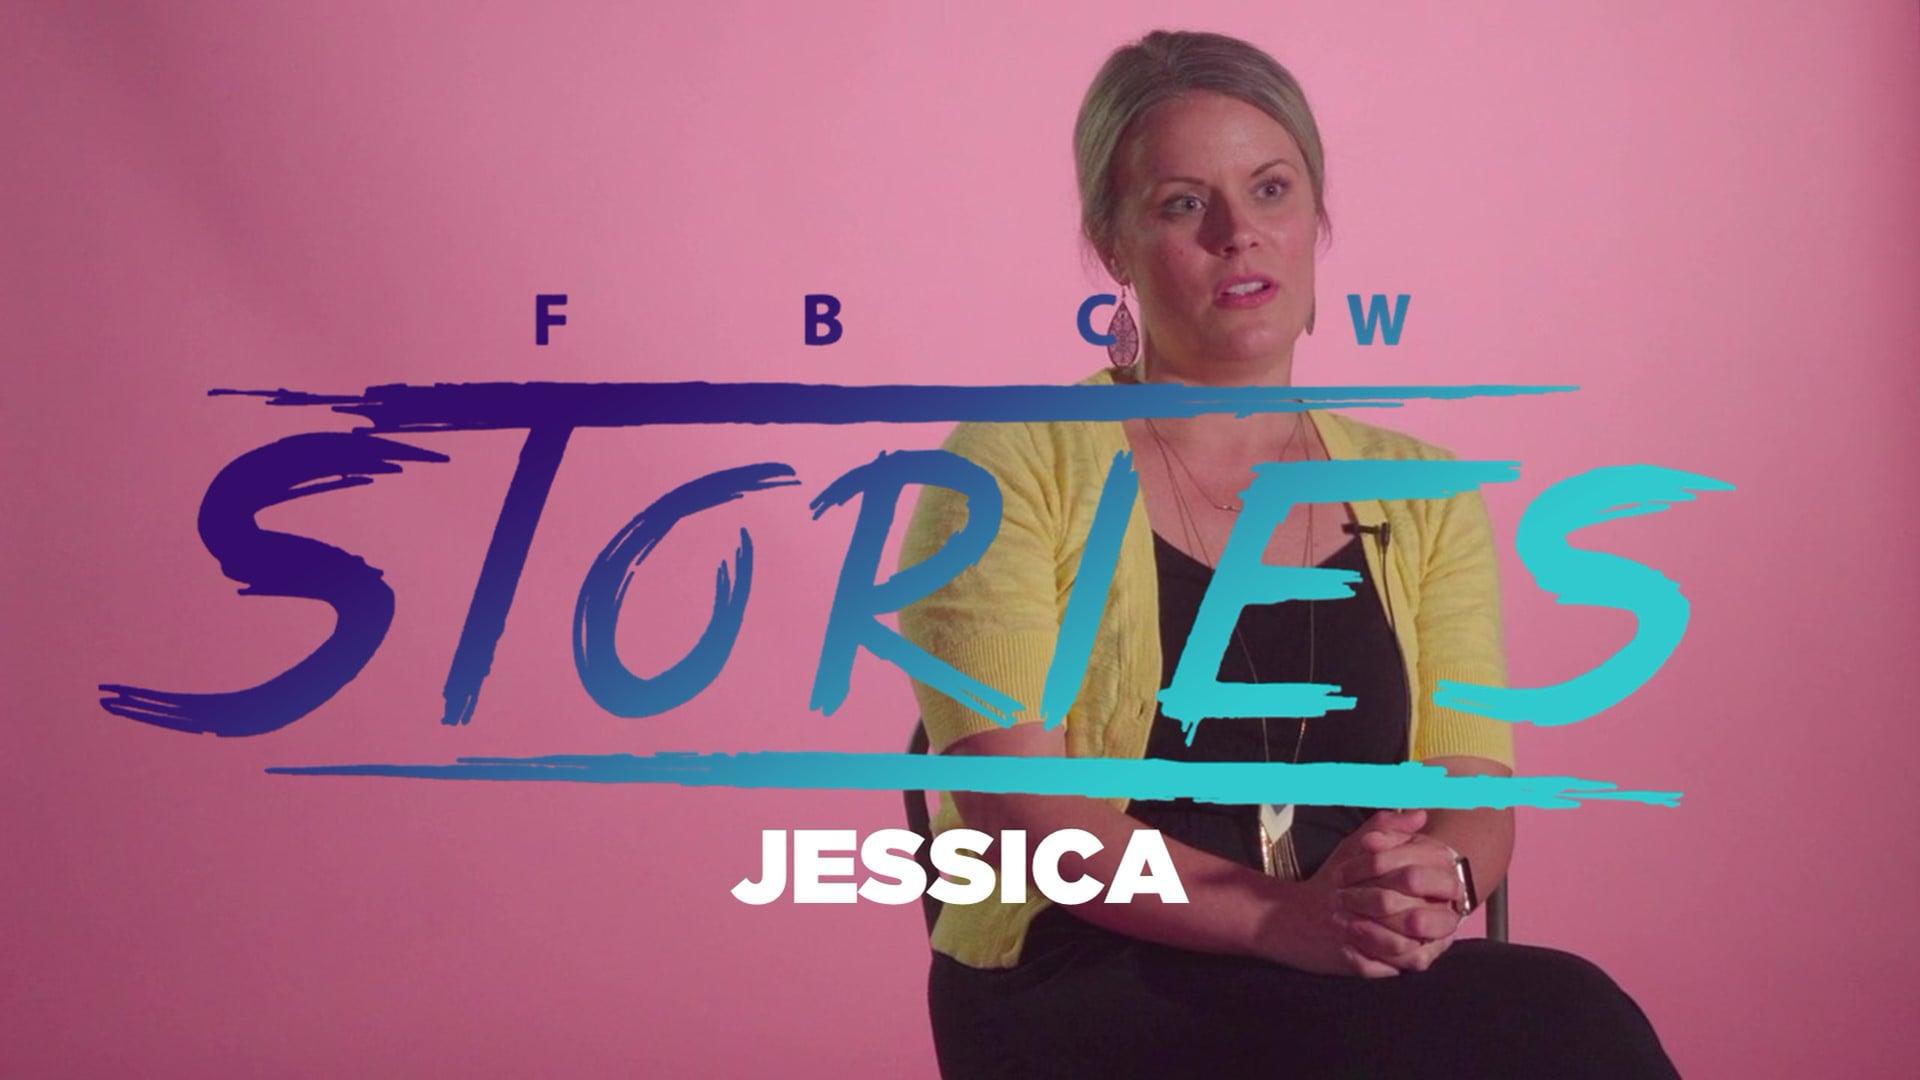 FBCW Stories Jessica